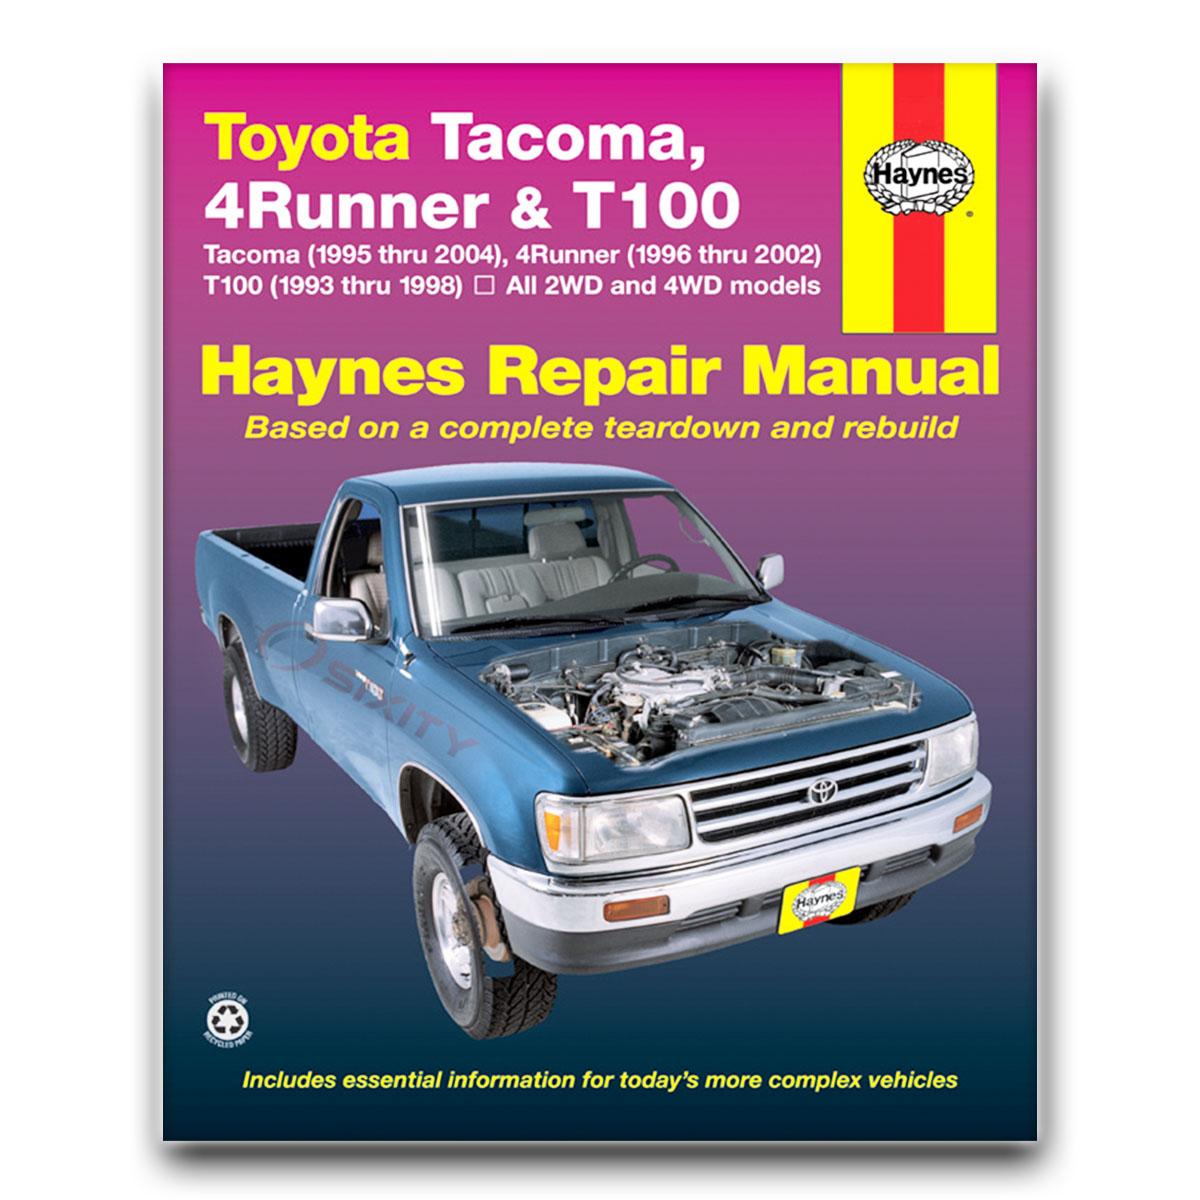 toyota 4runner haynes repair manual limited base sr5 shop service rh ebay com 1993 toyota 4runner owners manual 1993 toyota 4runner service manual pdf